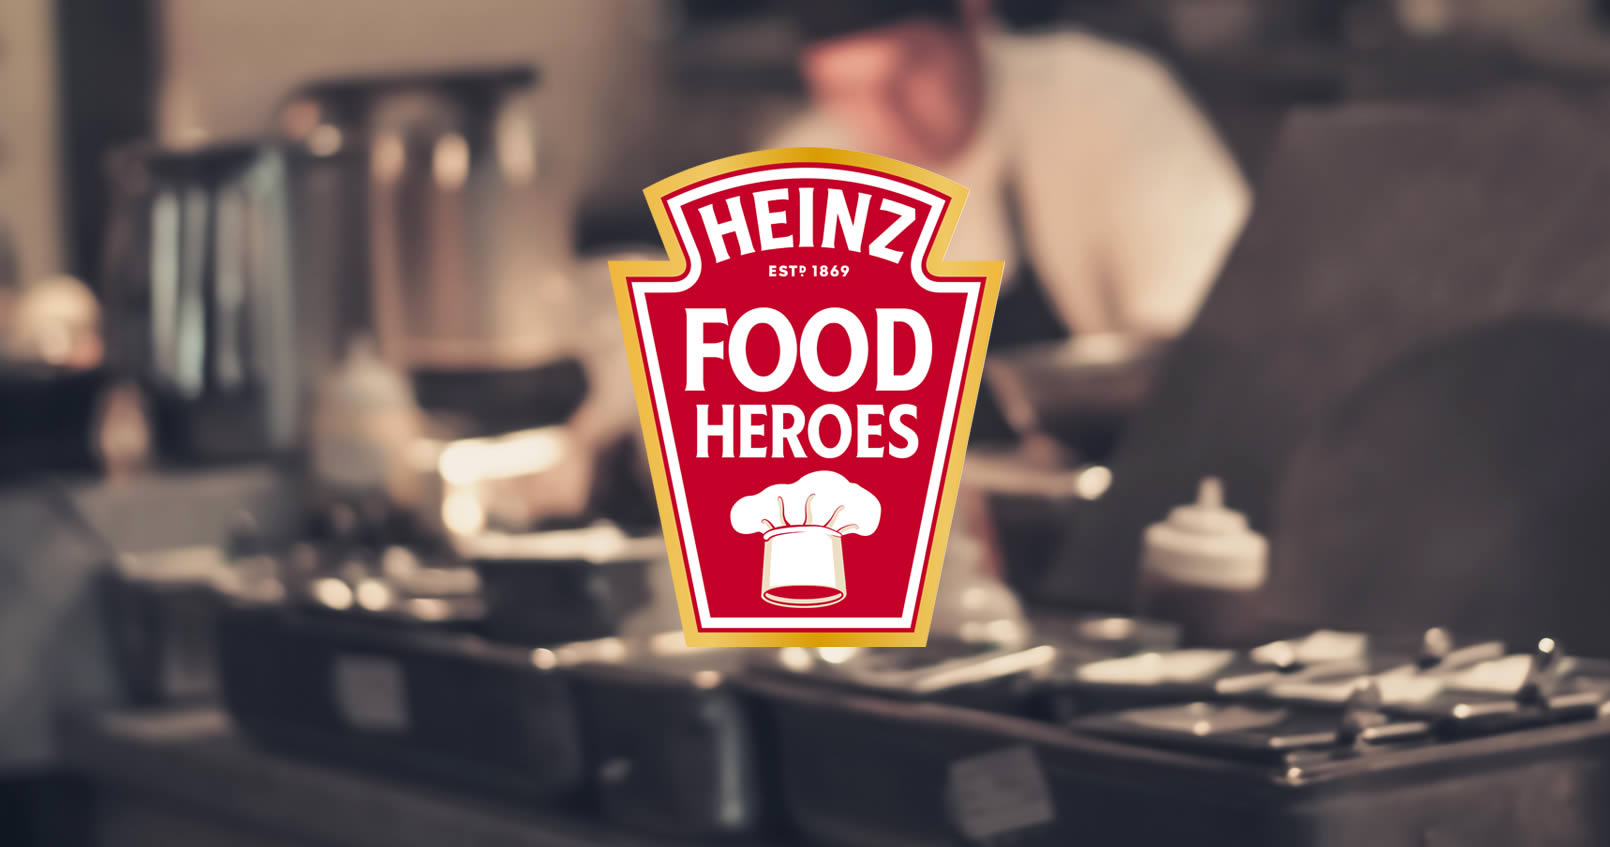 Heinz Food Heroes Banner image